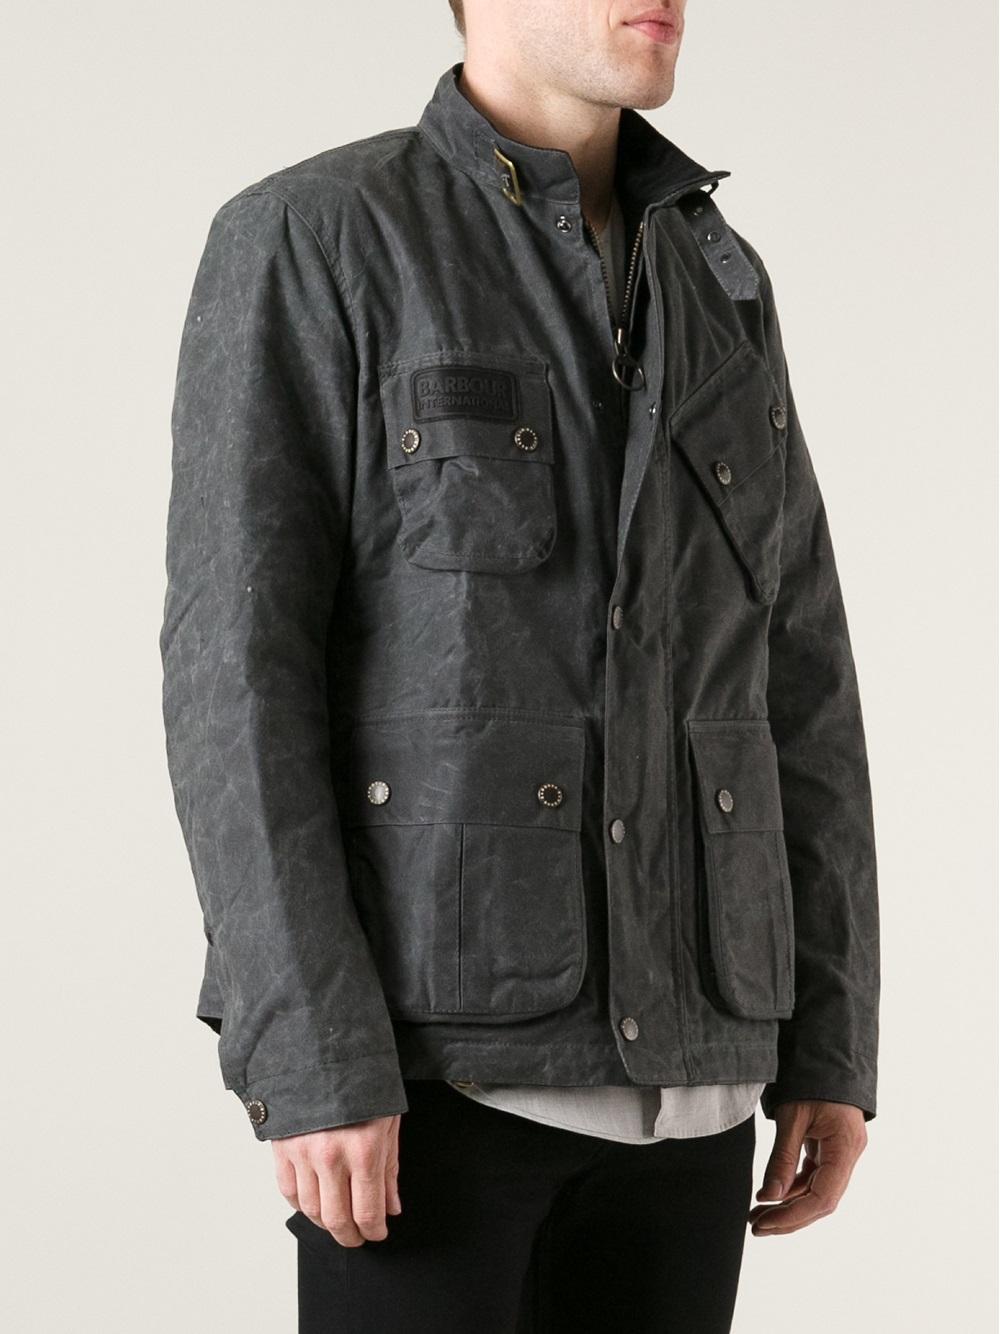 Buckle Jackets